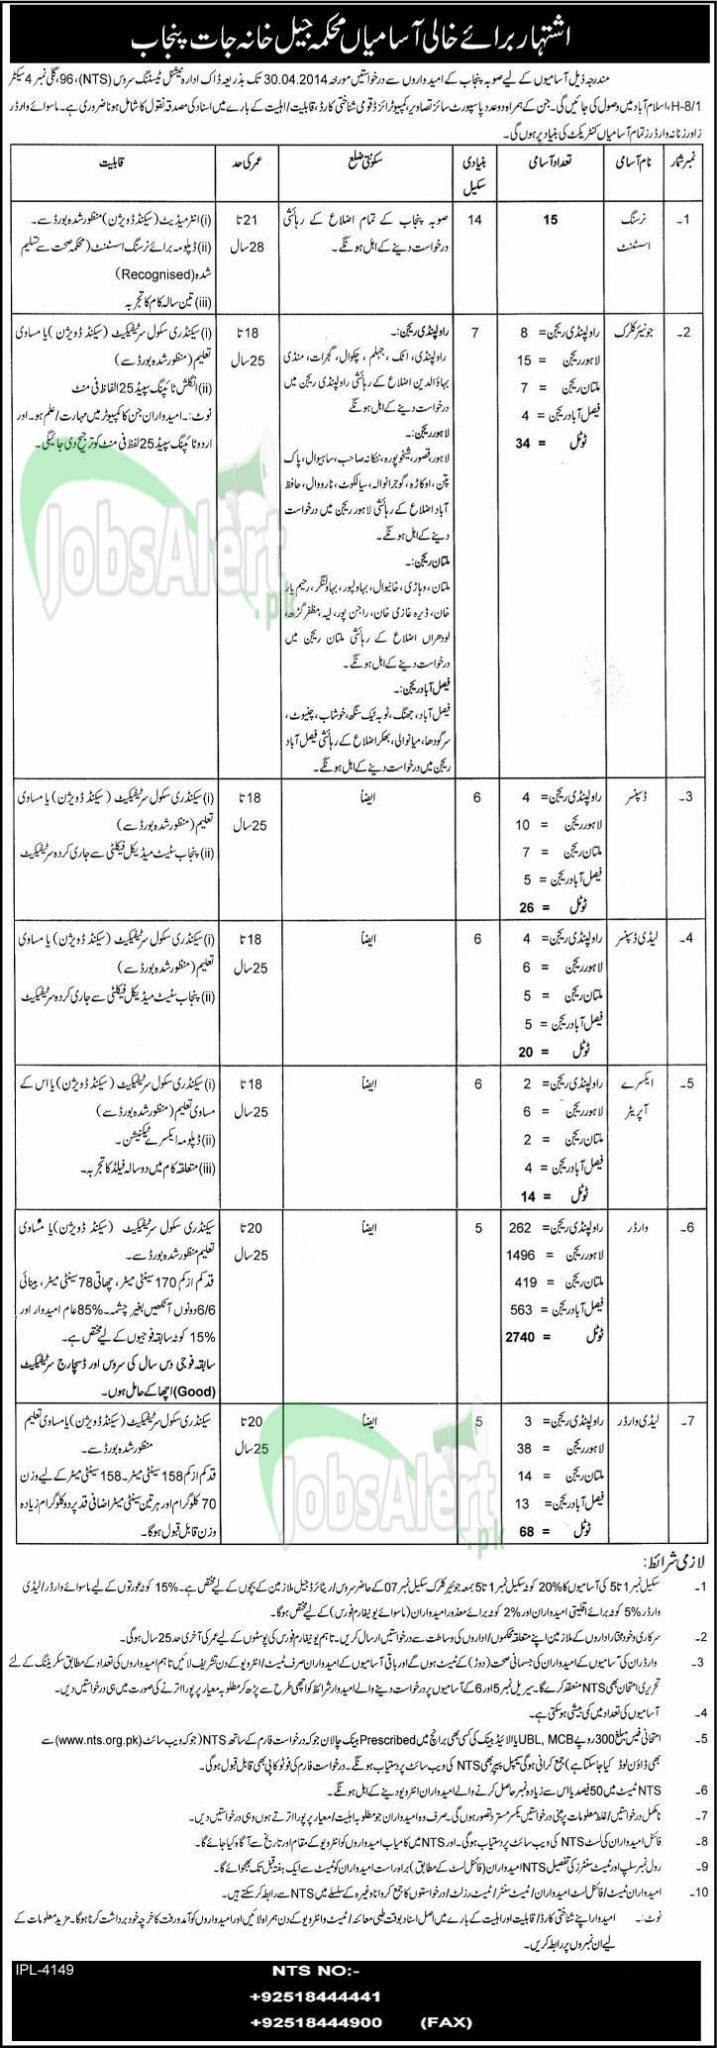 Jail Department Punjab NTS Jobs 2014 Govt. of Punjab Lahore